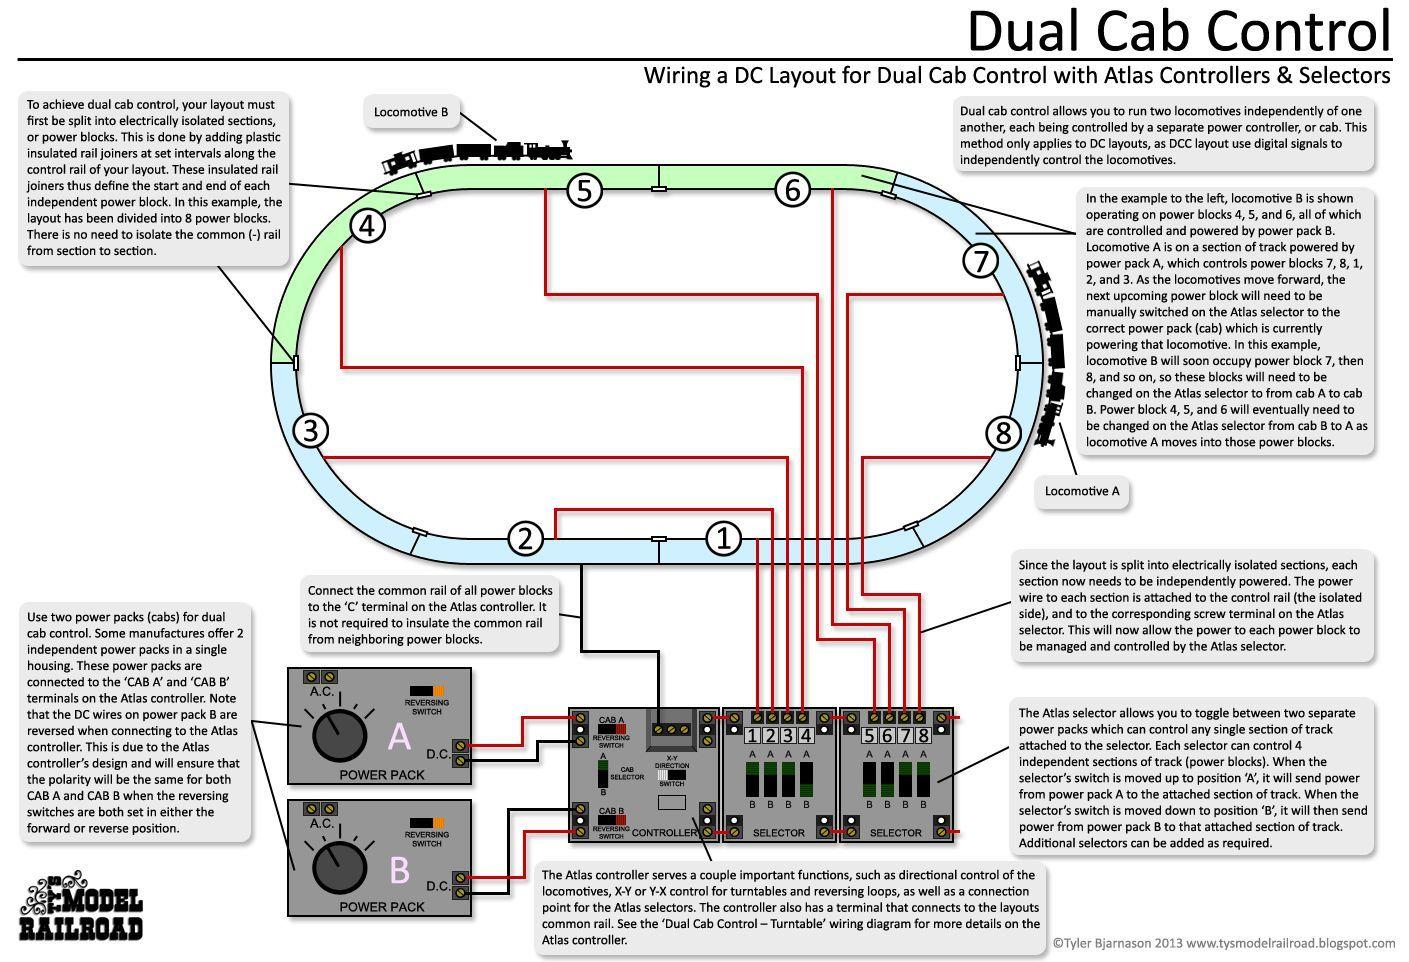 n scale track wiring wiring diagram data todayn scale track wiring wiring diagram n scale track [ 1409 x 962 Pixel ]